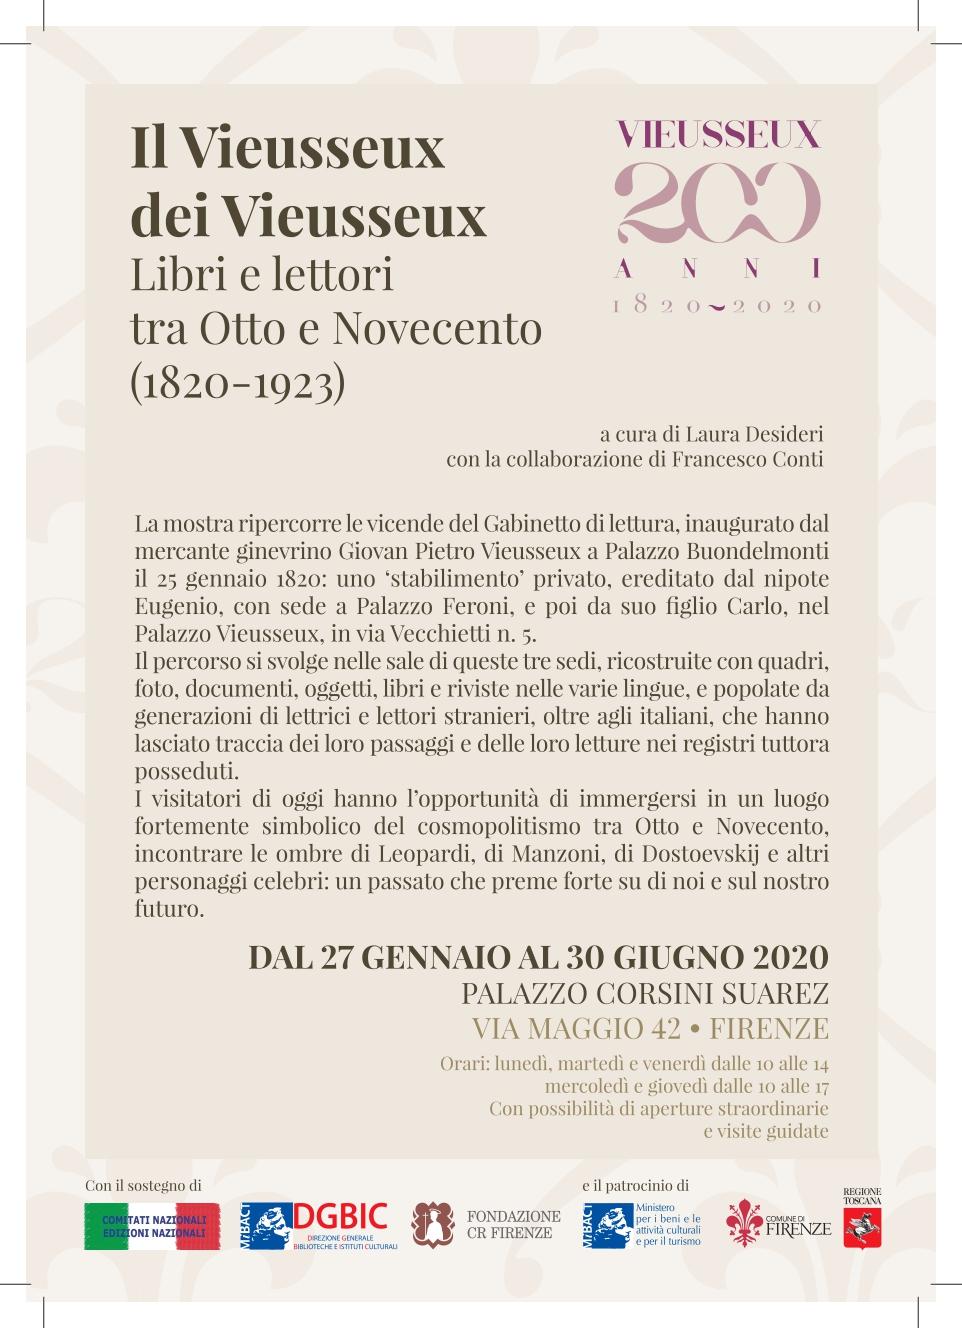 cartolina-mostra-vieusseux200_page-0002